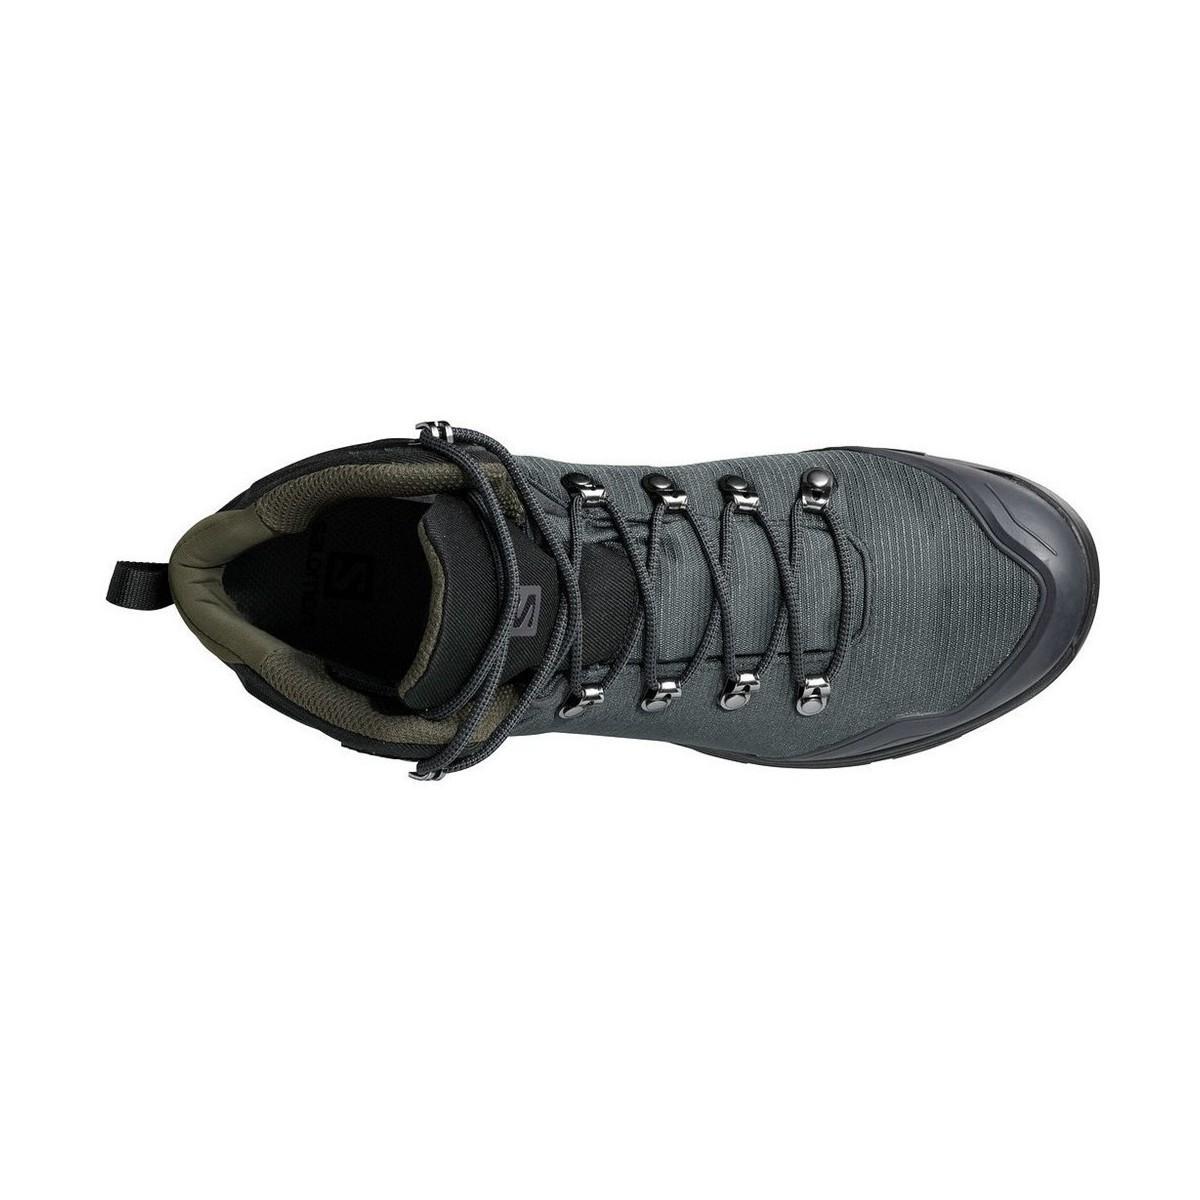 77023d5a84f Yves Salomon Outback 500 Gtx Men's Walking Boots In Multicolour in ...